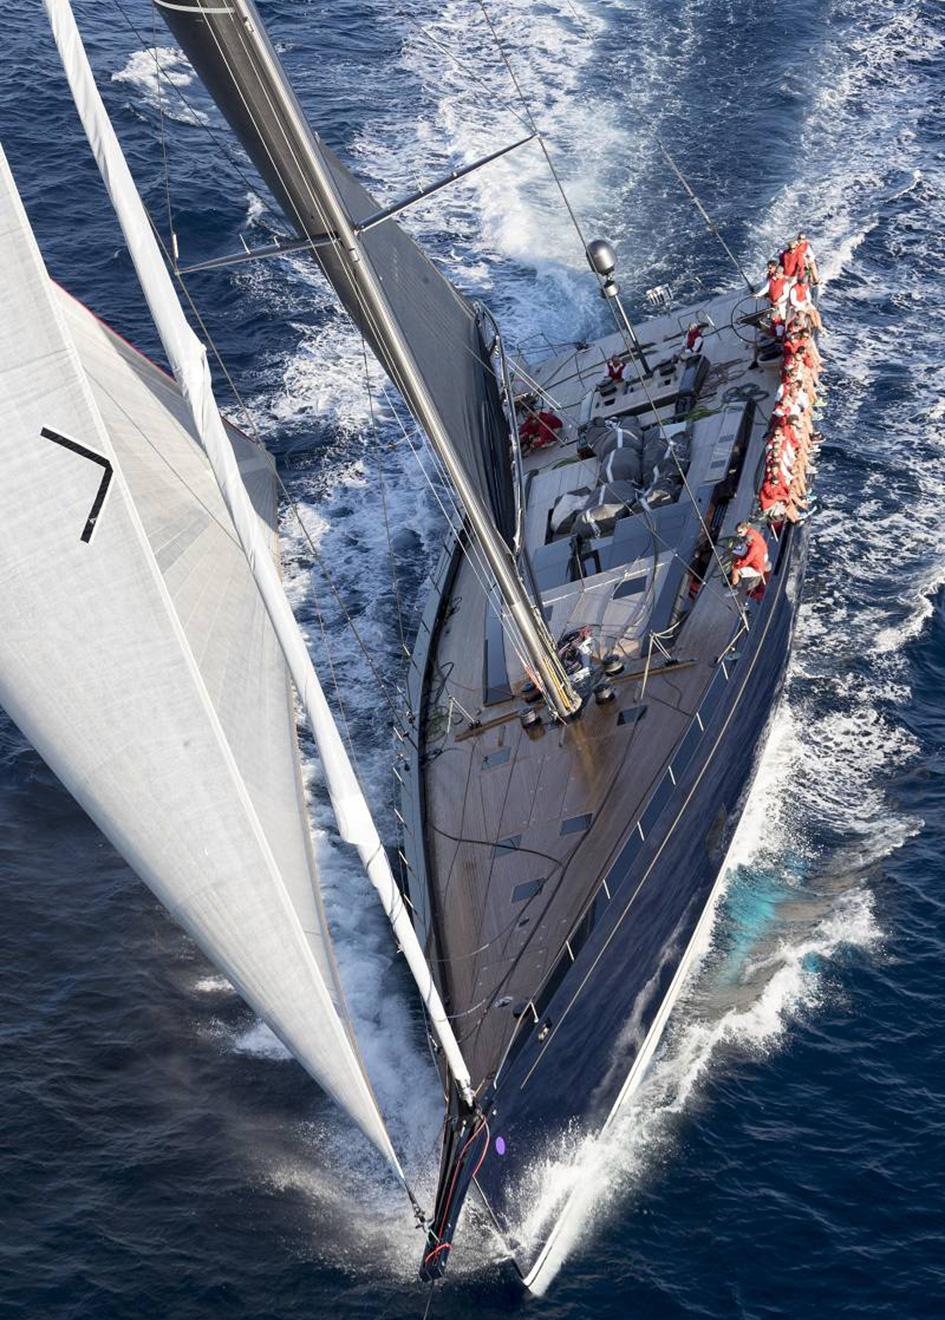 running-shot-of-Baltic-130-custom-sailing-super-yacht-my-song